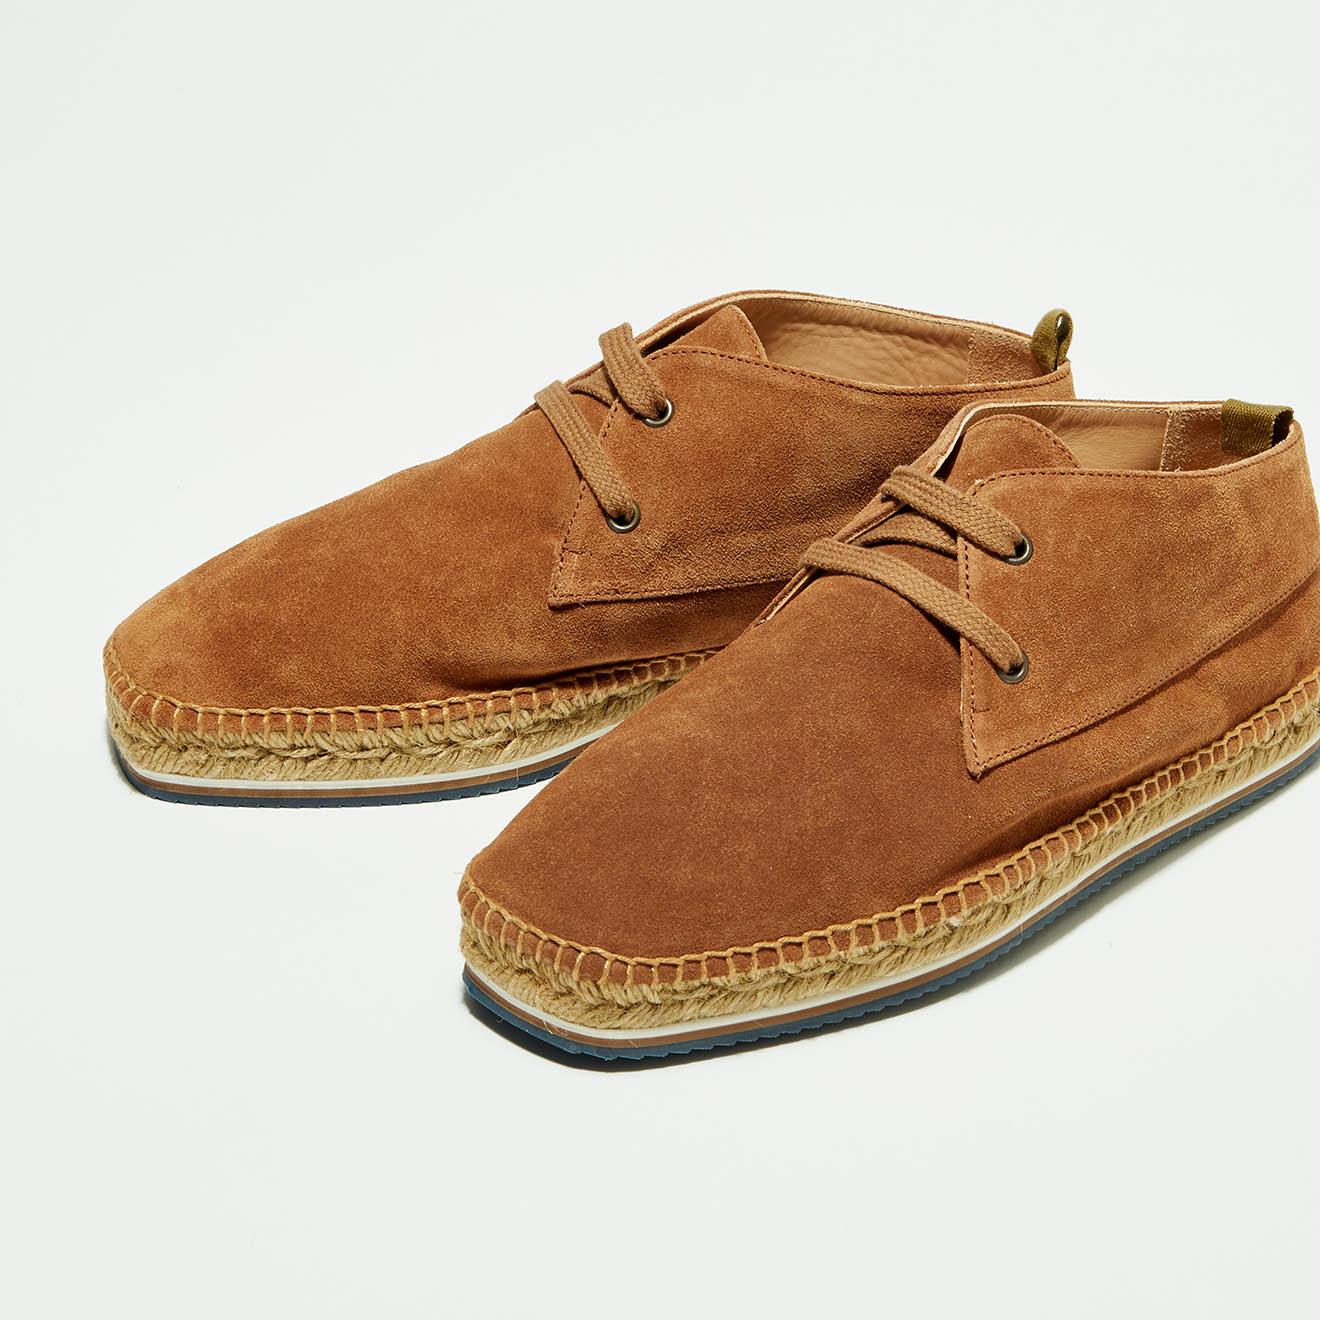 Chukka boots en Velours de Cuir Bruno camel - Castaner - Modalova